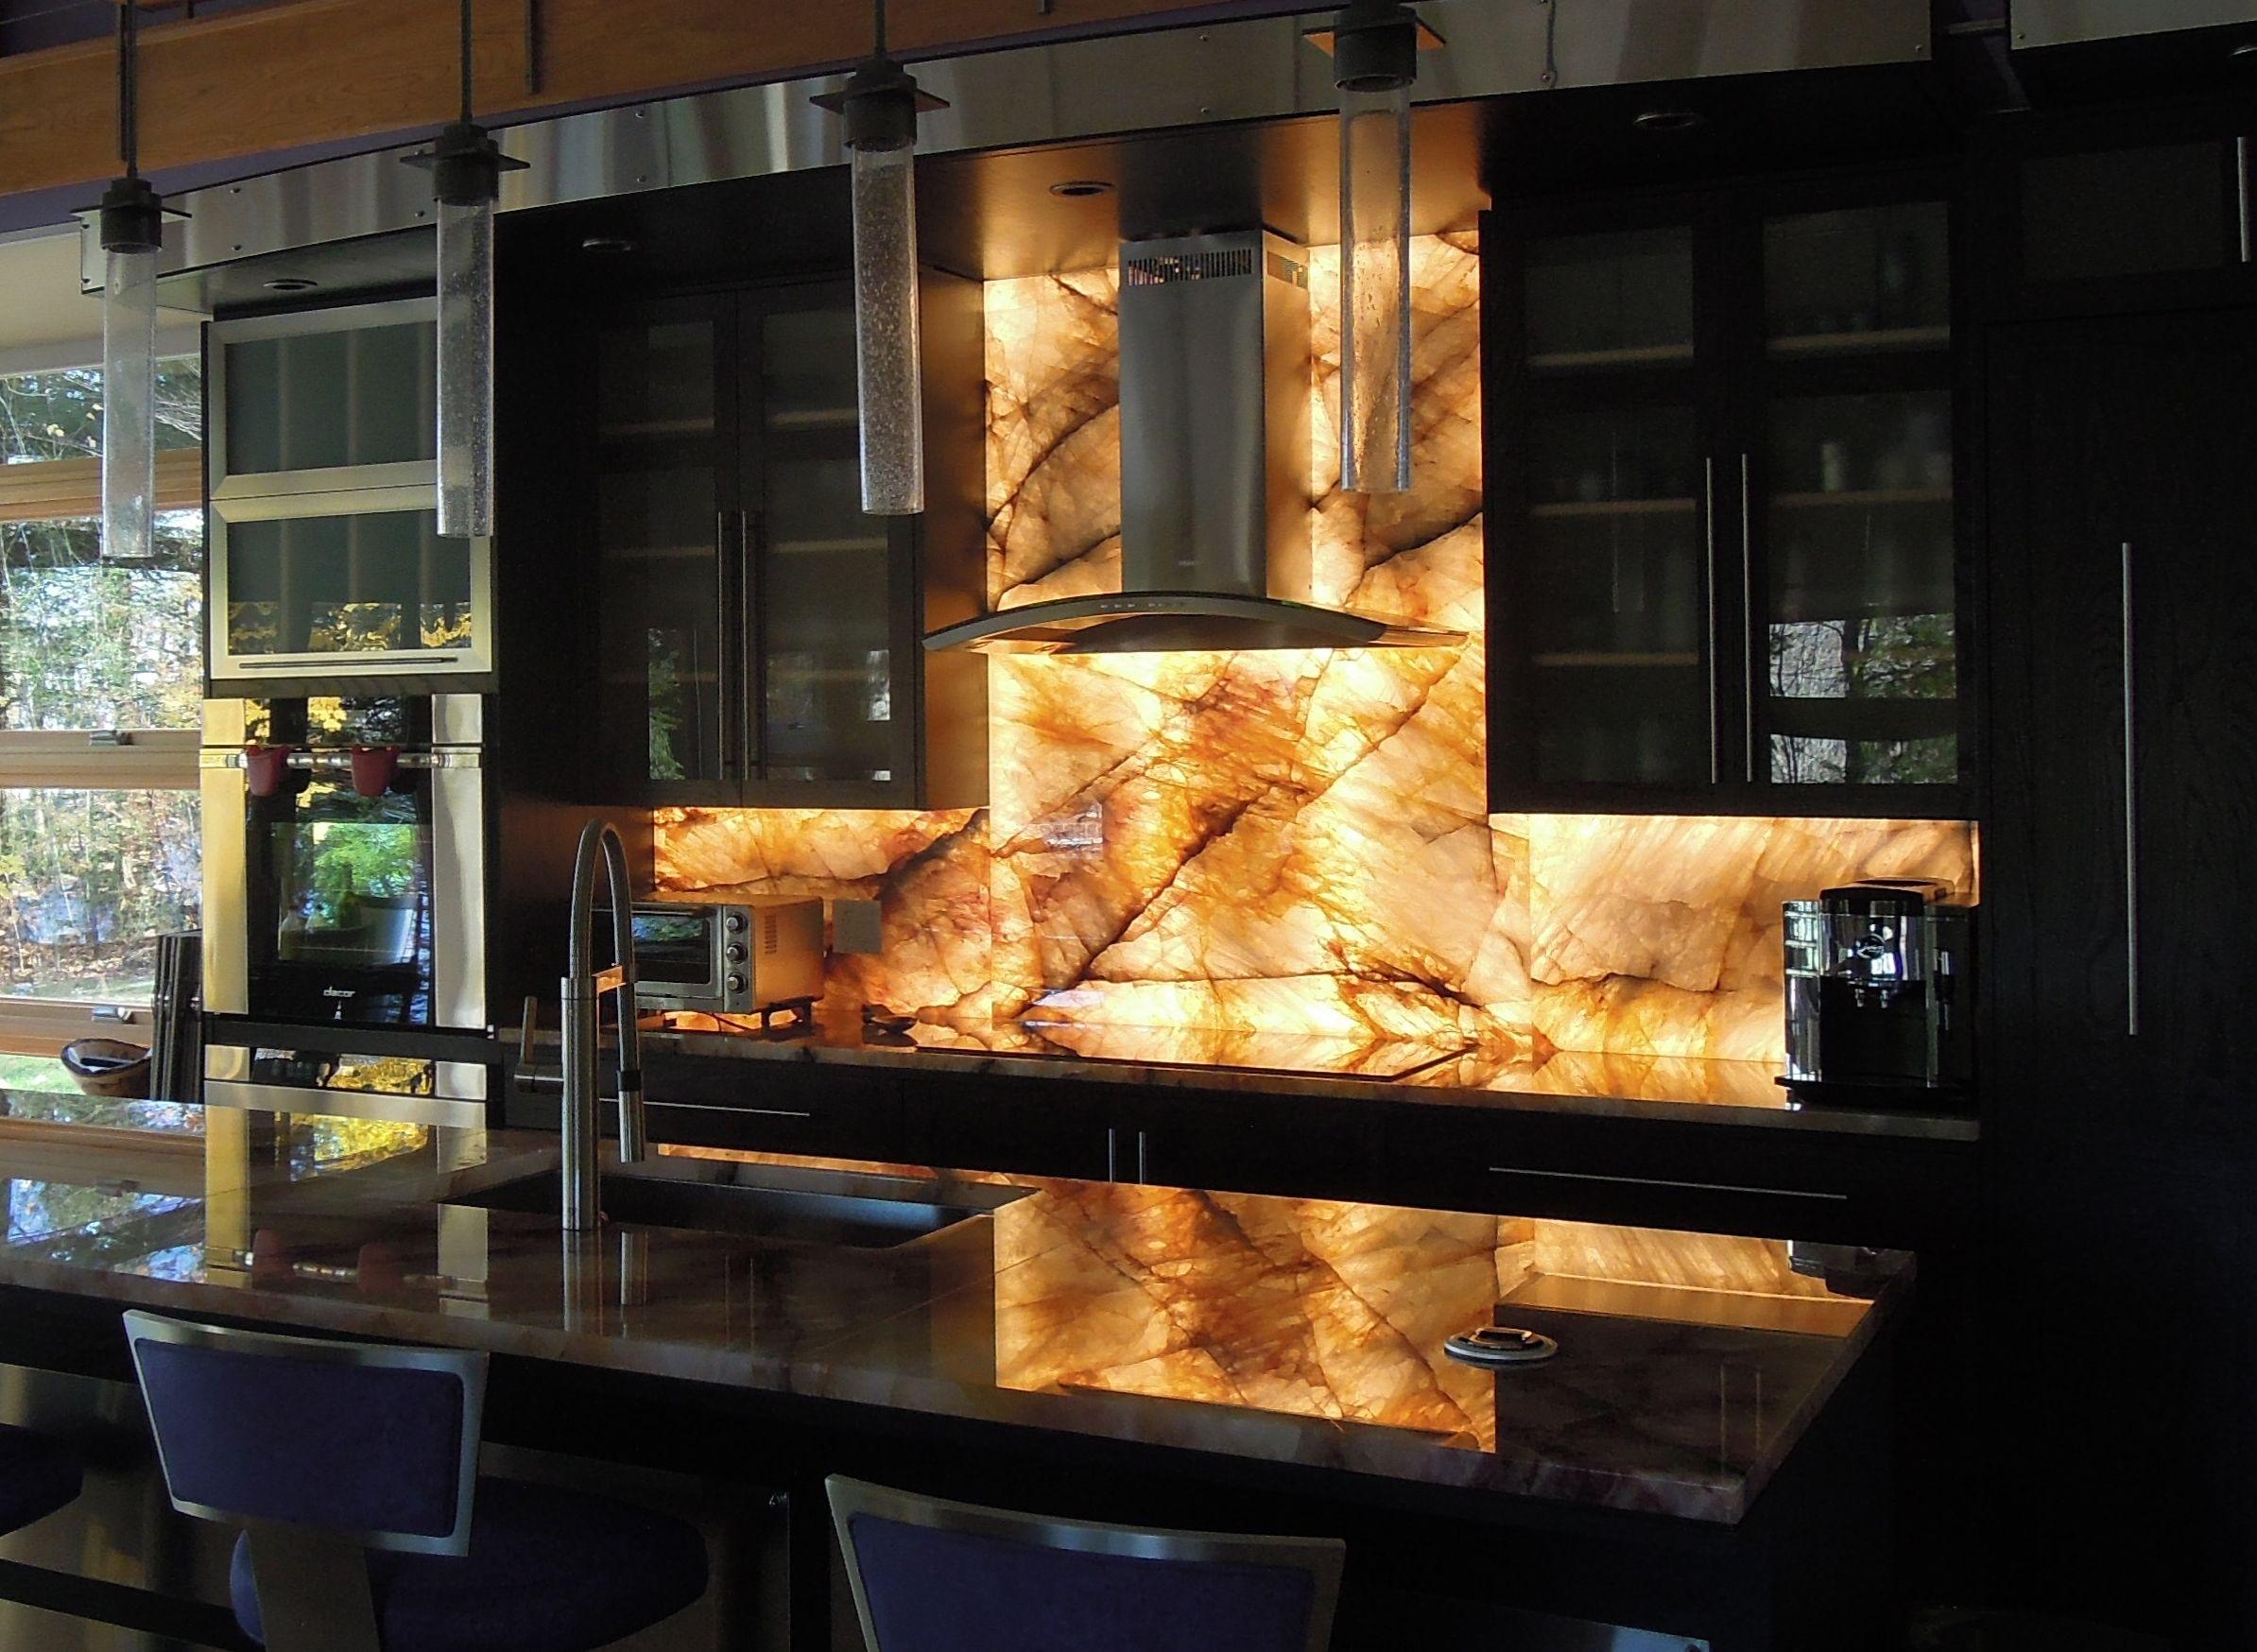 Collection Illuminated Kitchen Backsplash Pictures - Kitchen ... on lighted pot rack kitchen, mirror and light kitchen, lighted cabinet kitchen, can lights in kitchen,